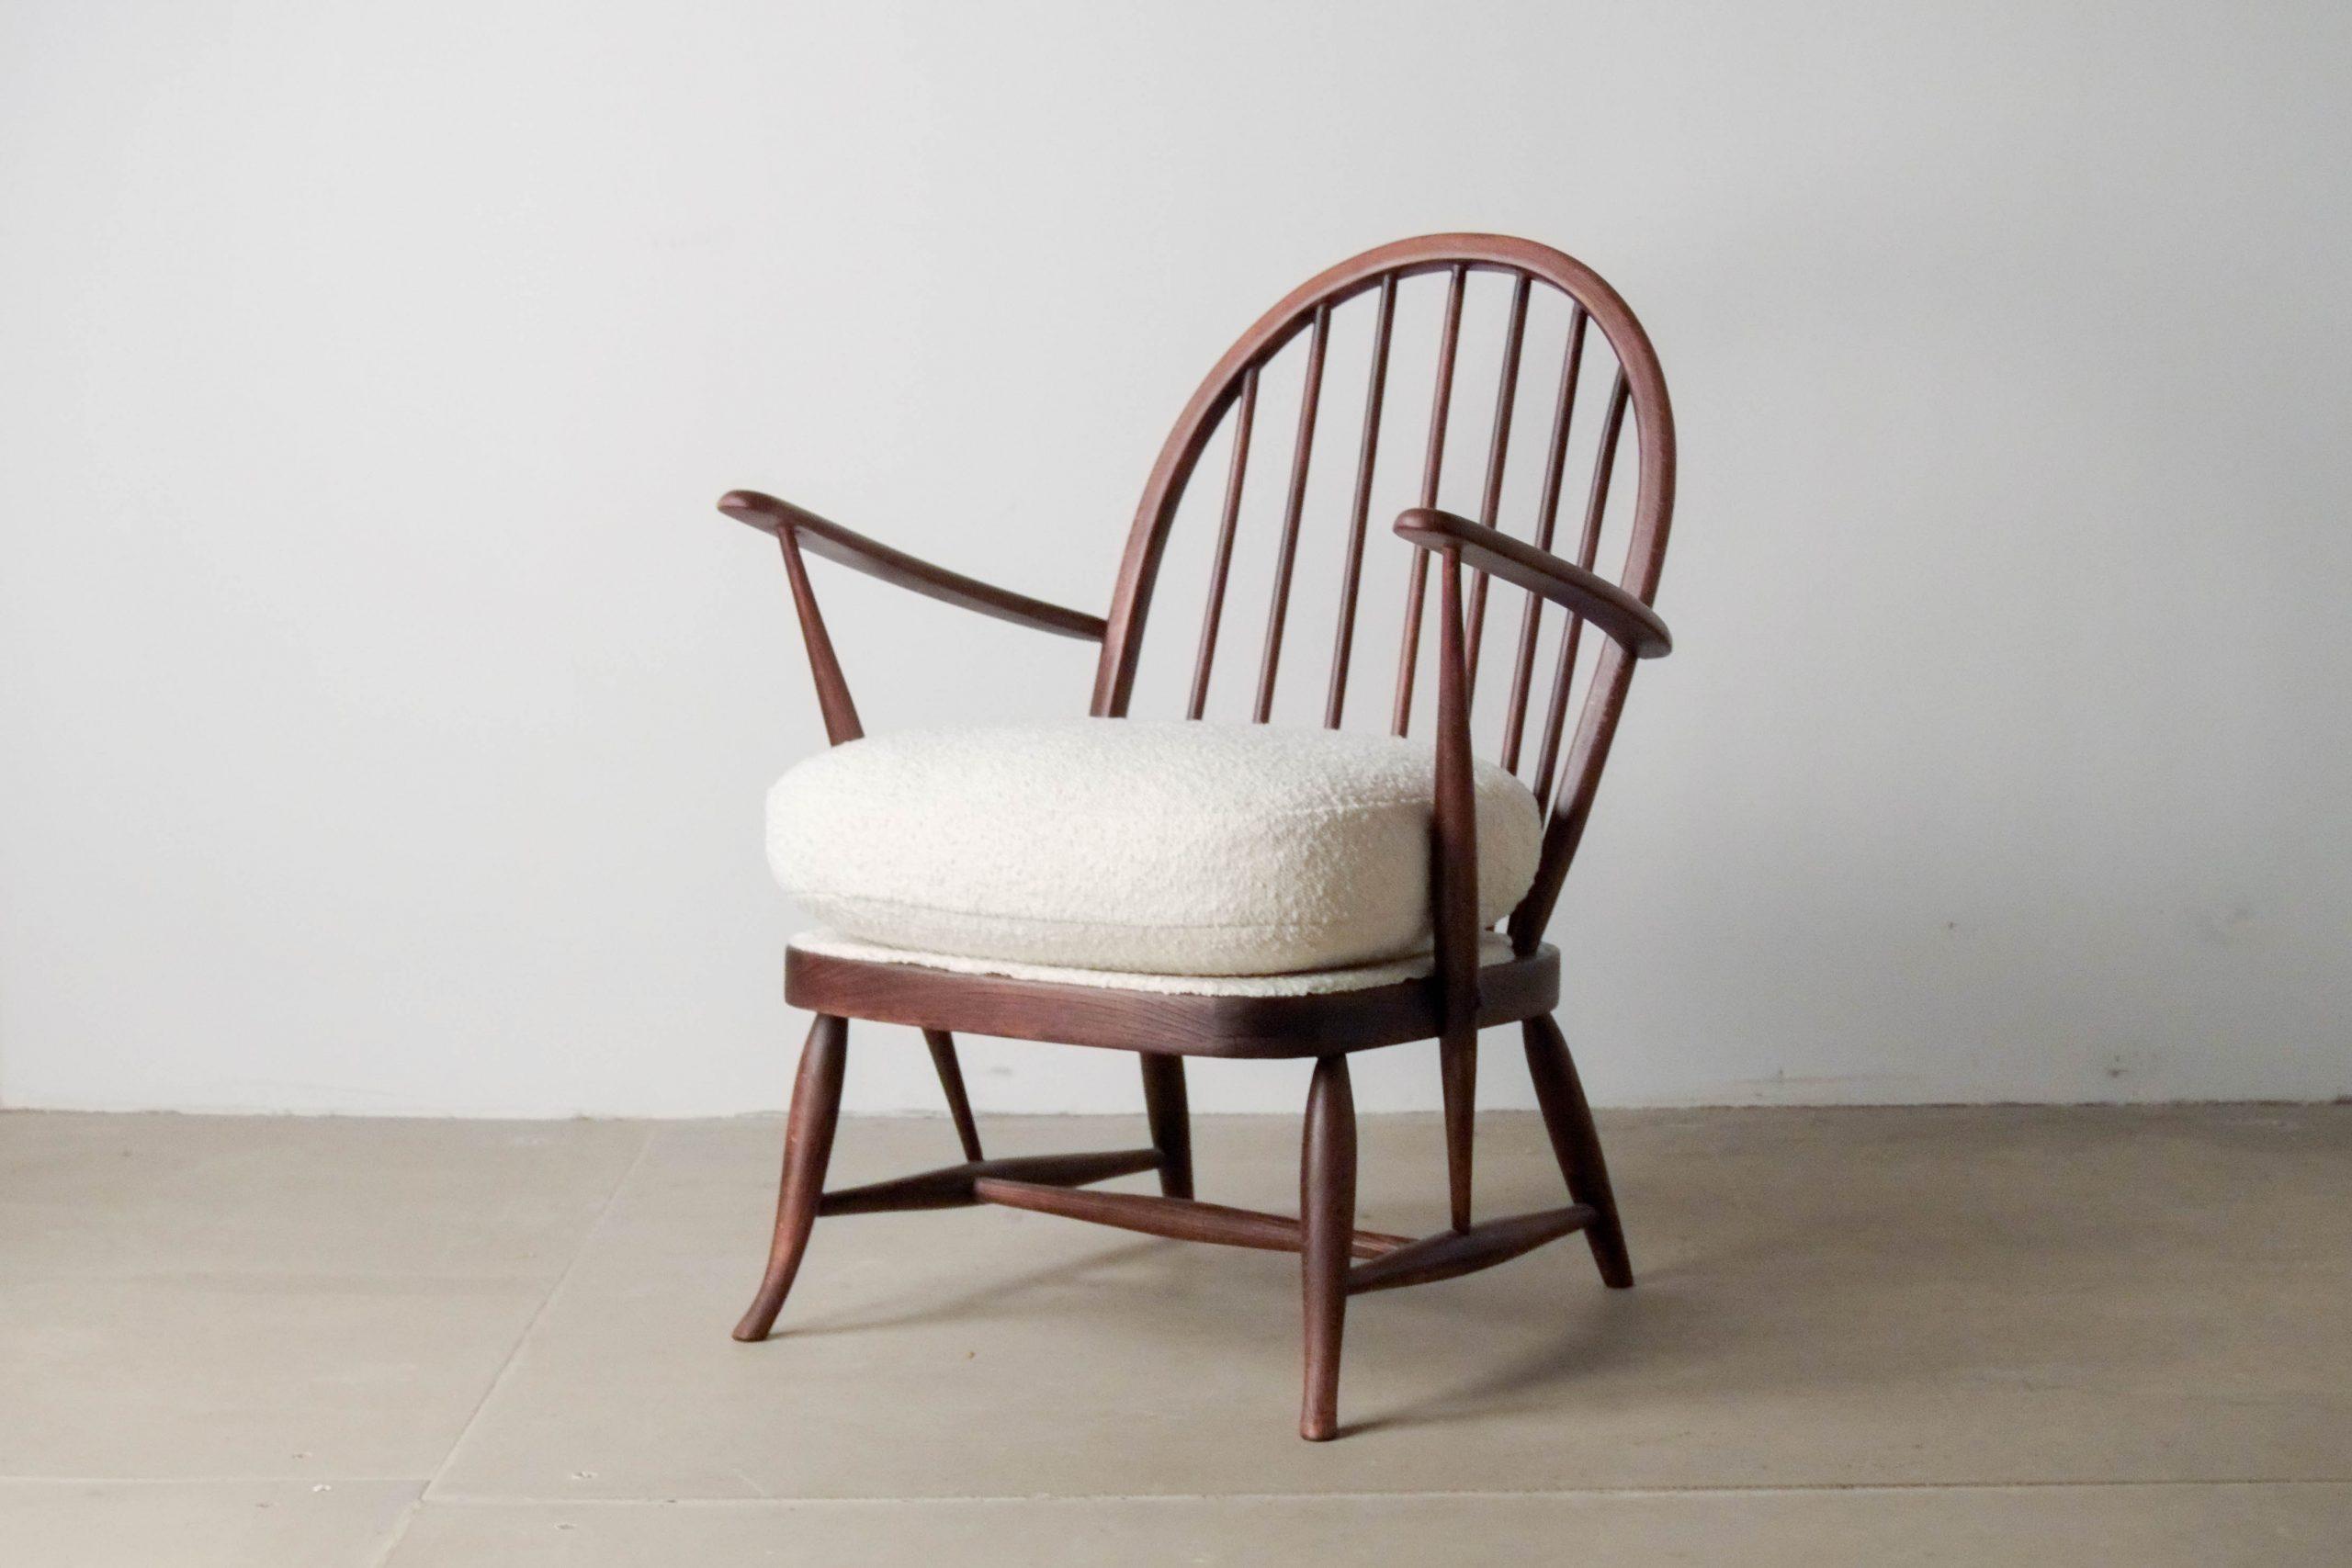 butaca de diseño madera ebanista vintage retro ercol